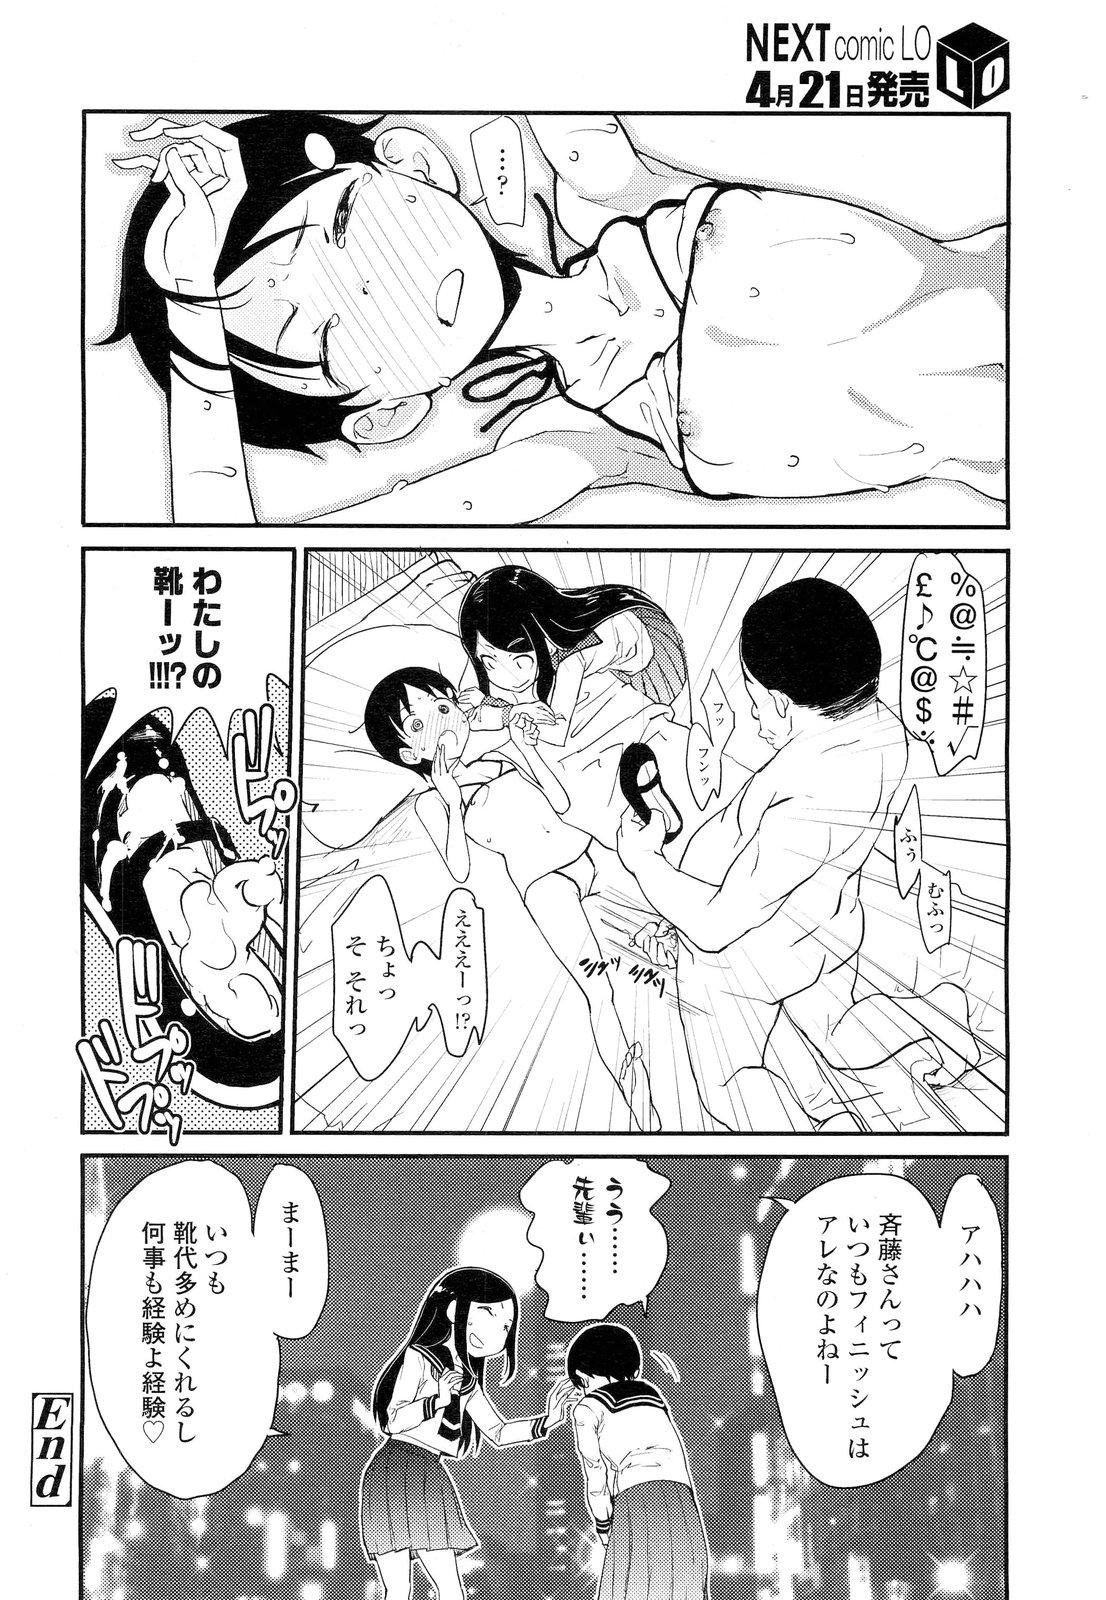 COMIC LO 2012-05 Vol. 98 161